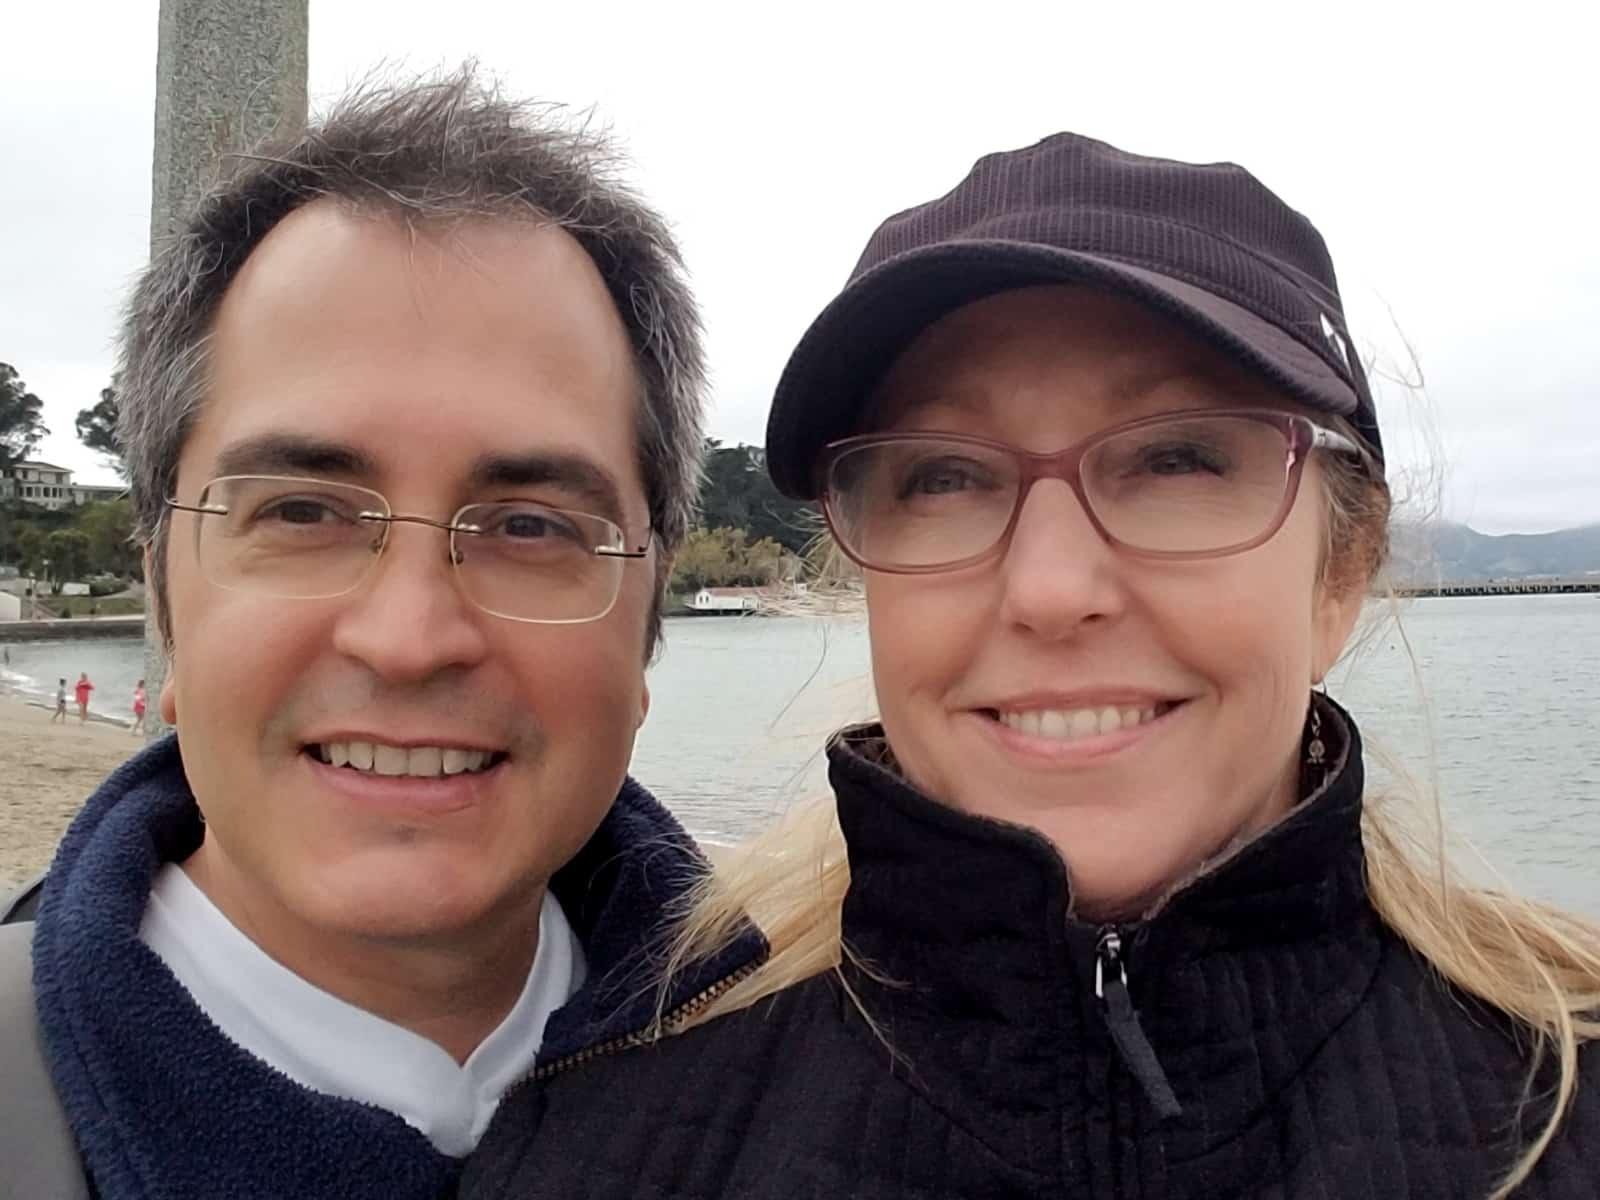 Danica & John from Windermere, Florida, United States